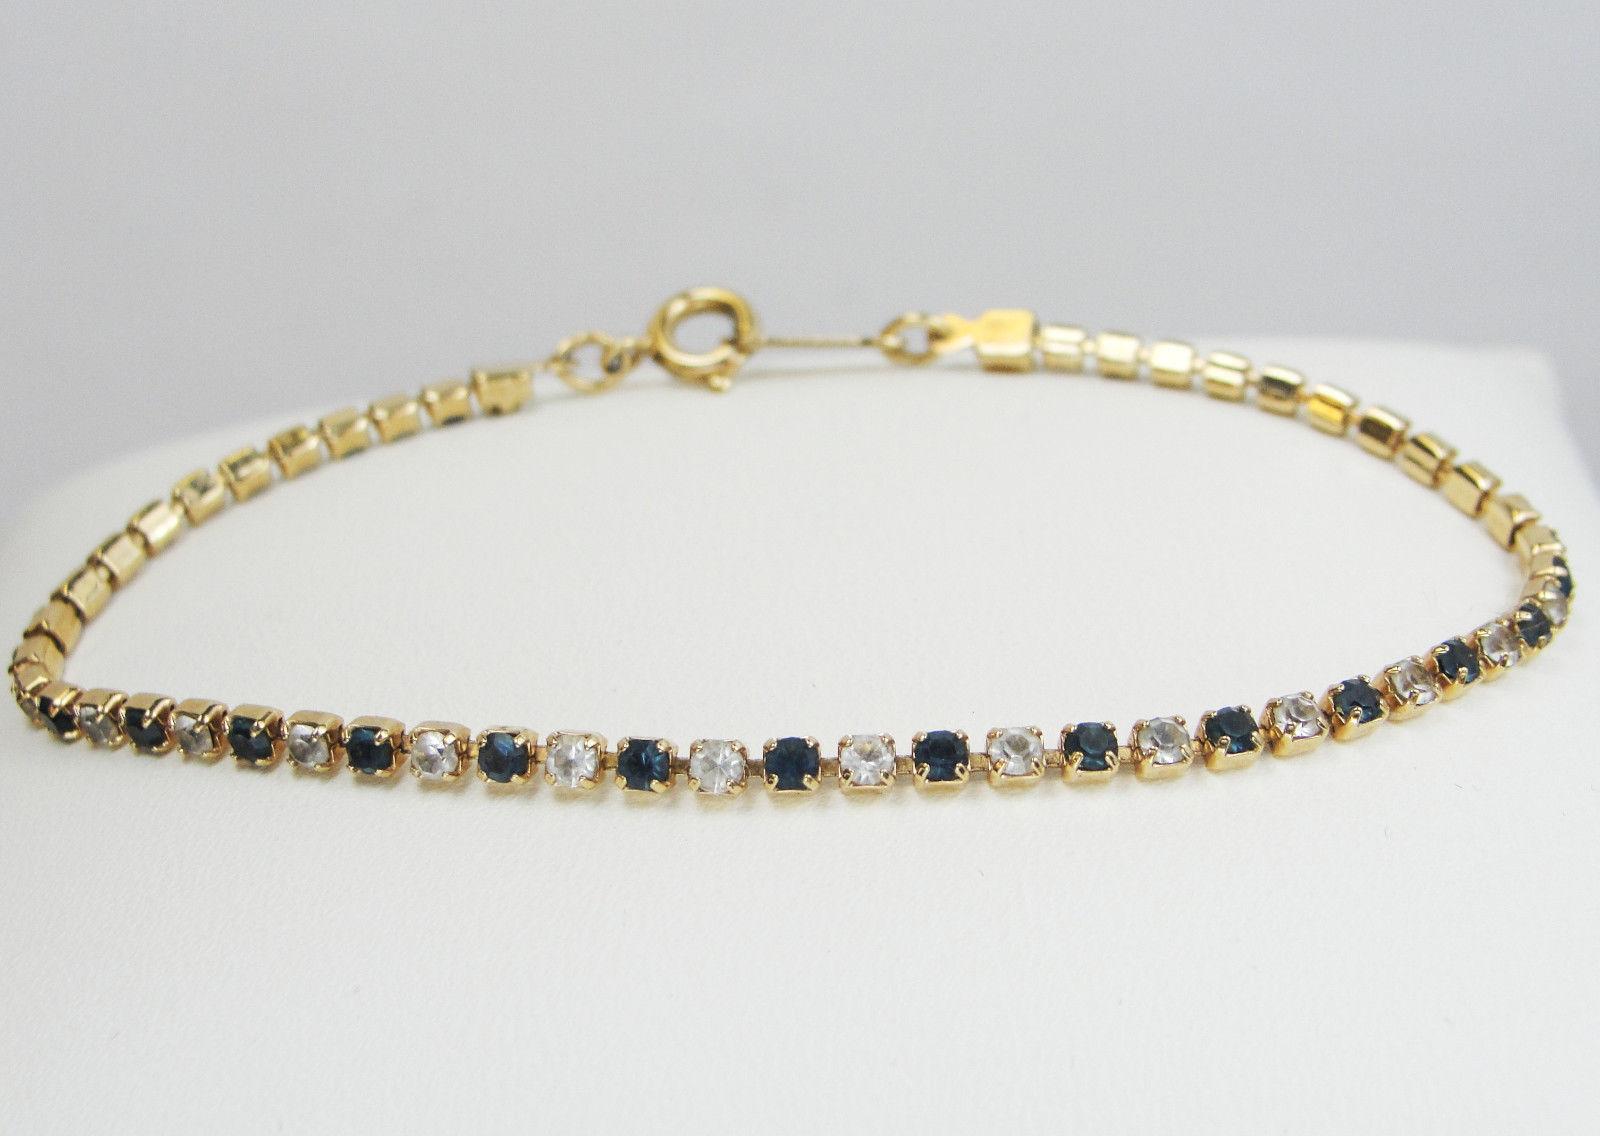 Vintage AVON Gold Tone Rhinestone Bracelet * The Look of Diamonds & Sapphires *